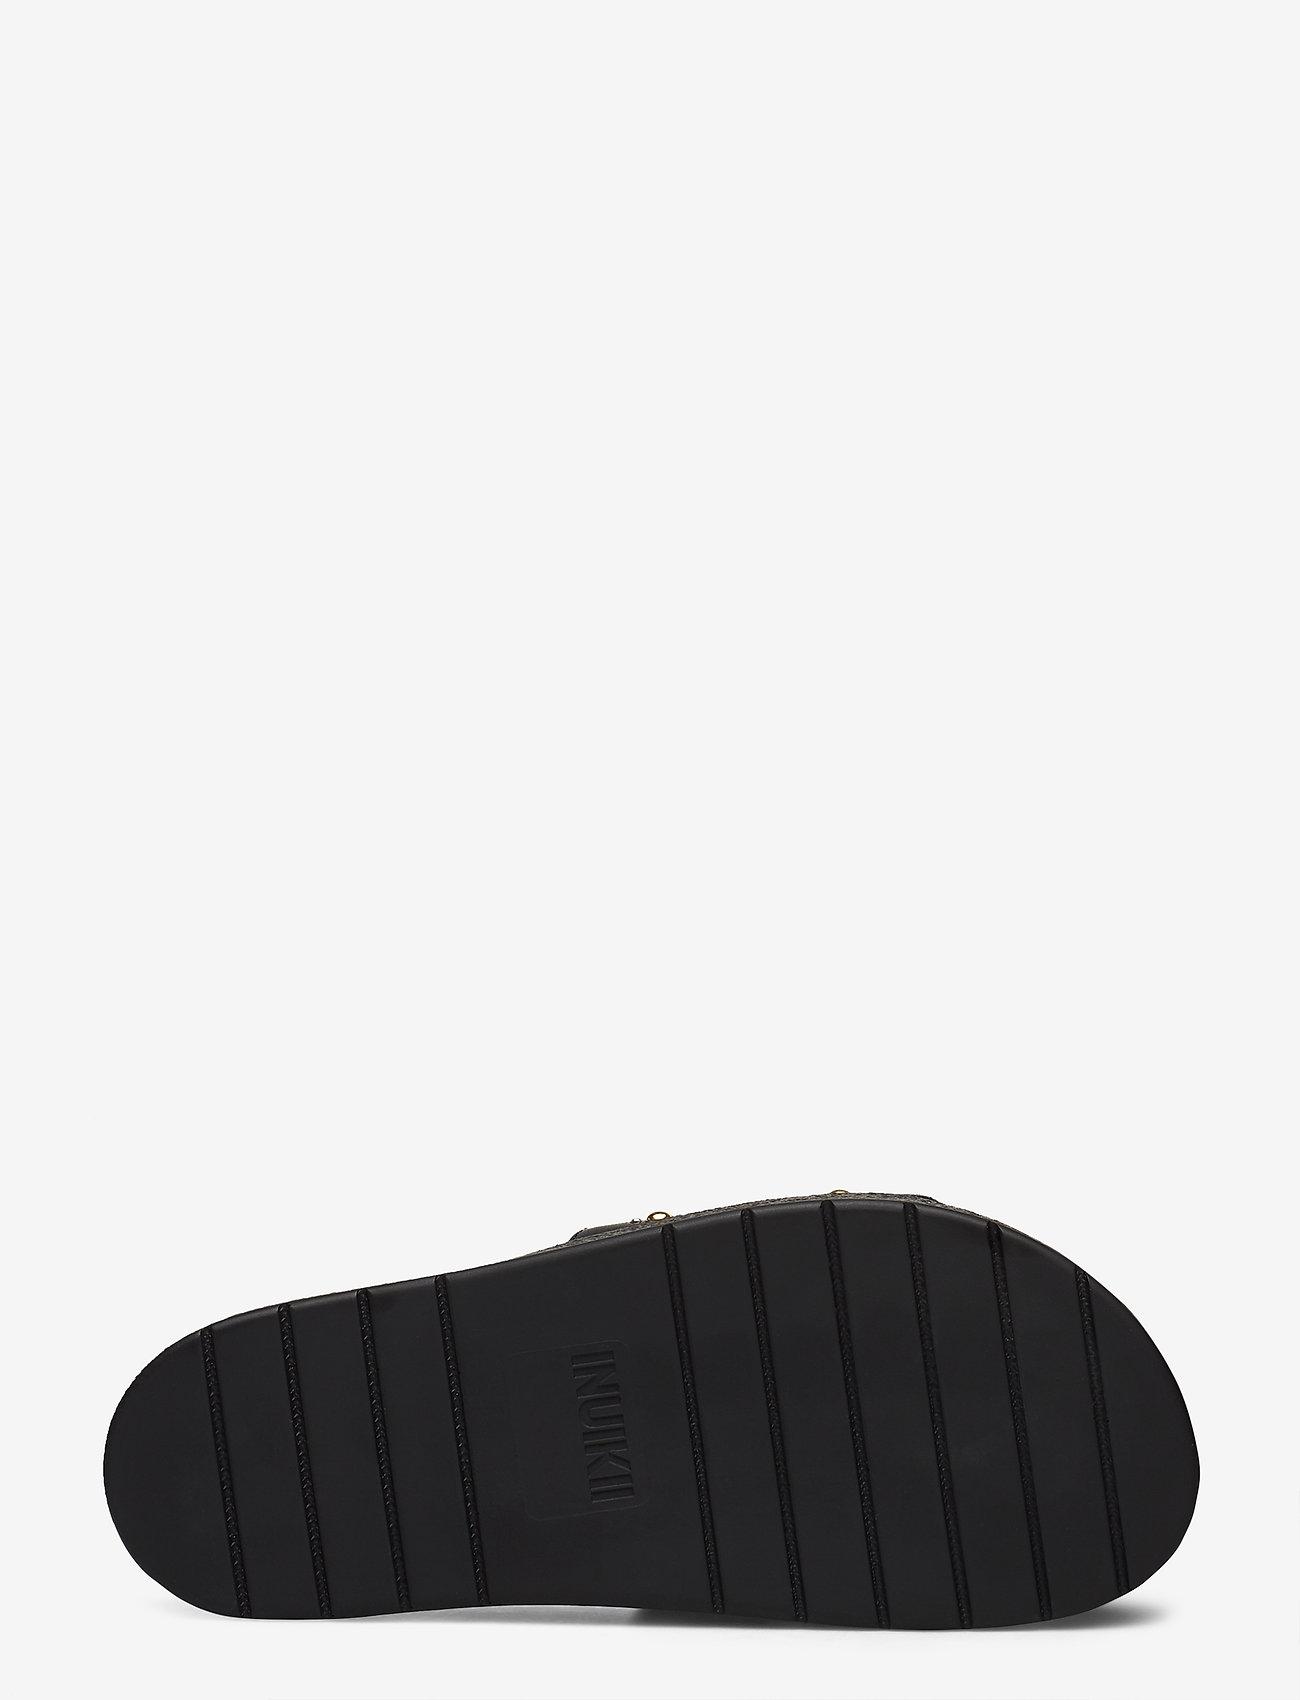 Inuikii Slipper Dipama Studs (Black) - Inuikii